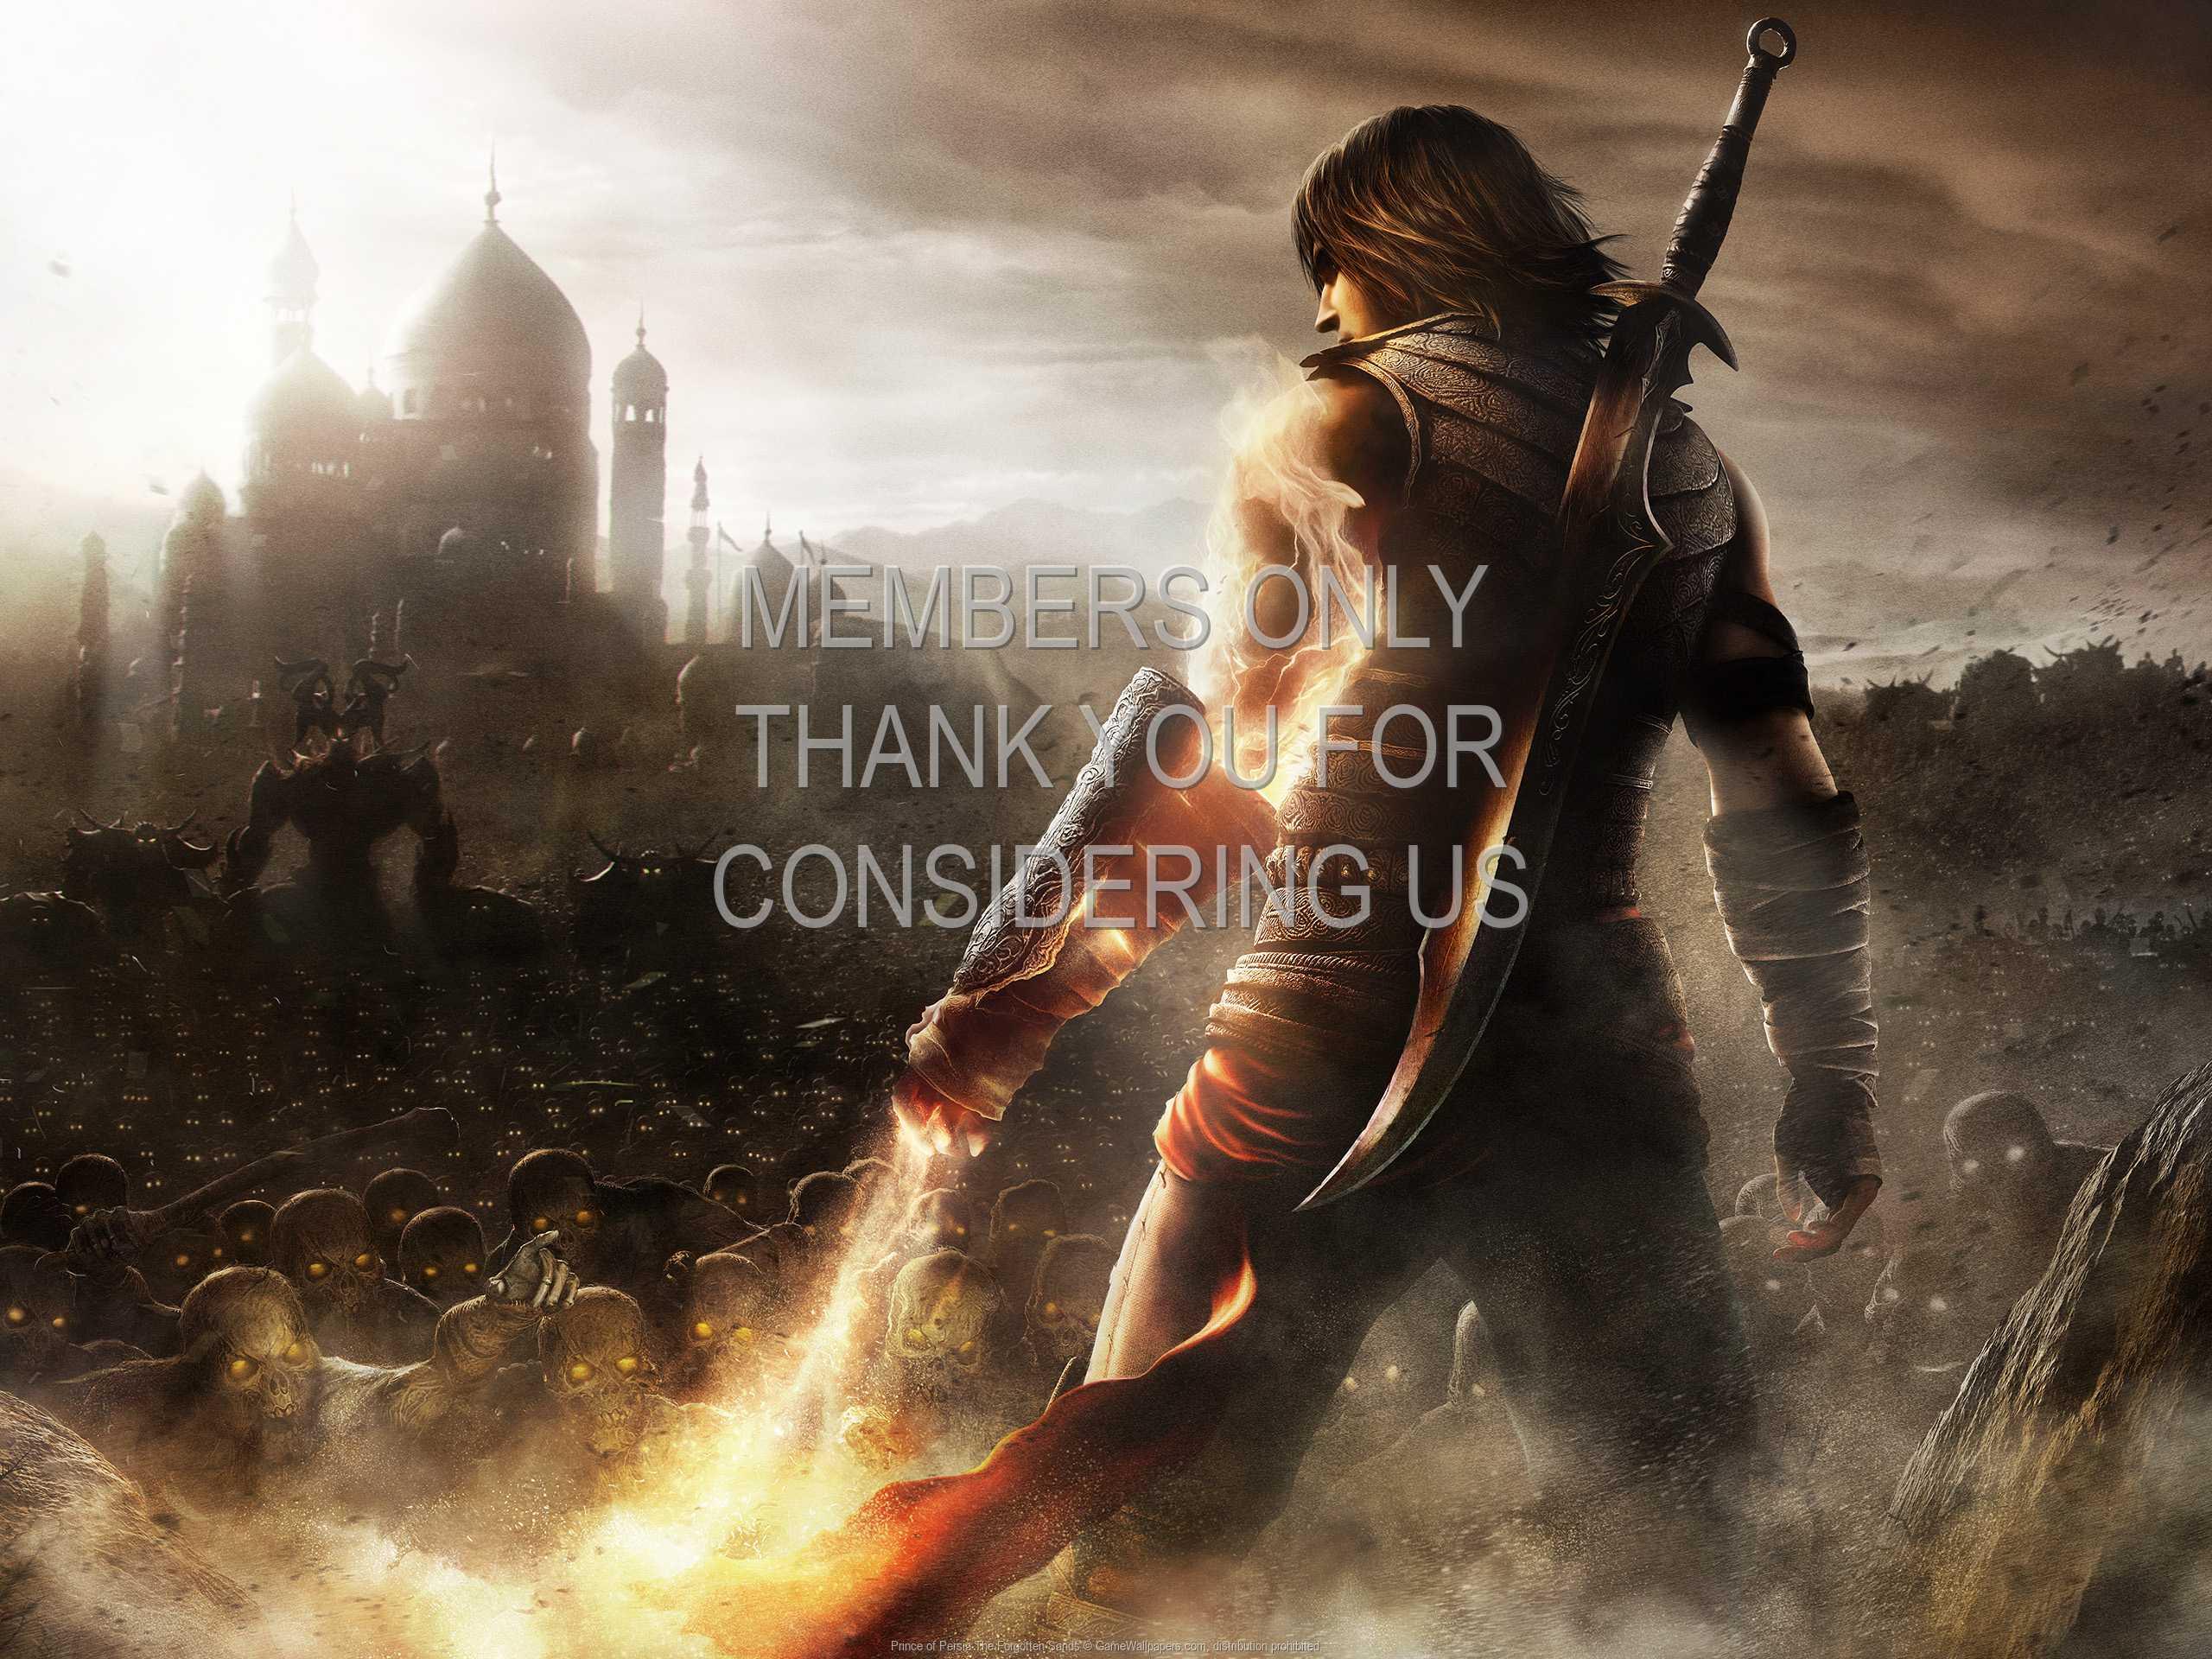 Prince of Persia: The Forgotten Sands 1080p Horizontal Handy Hintergrundbild 05